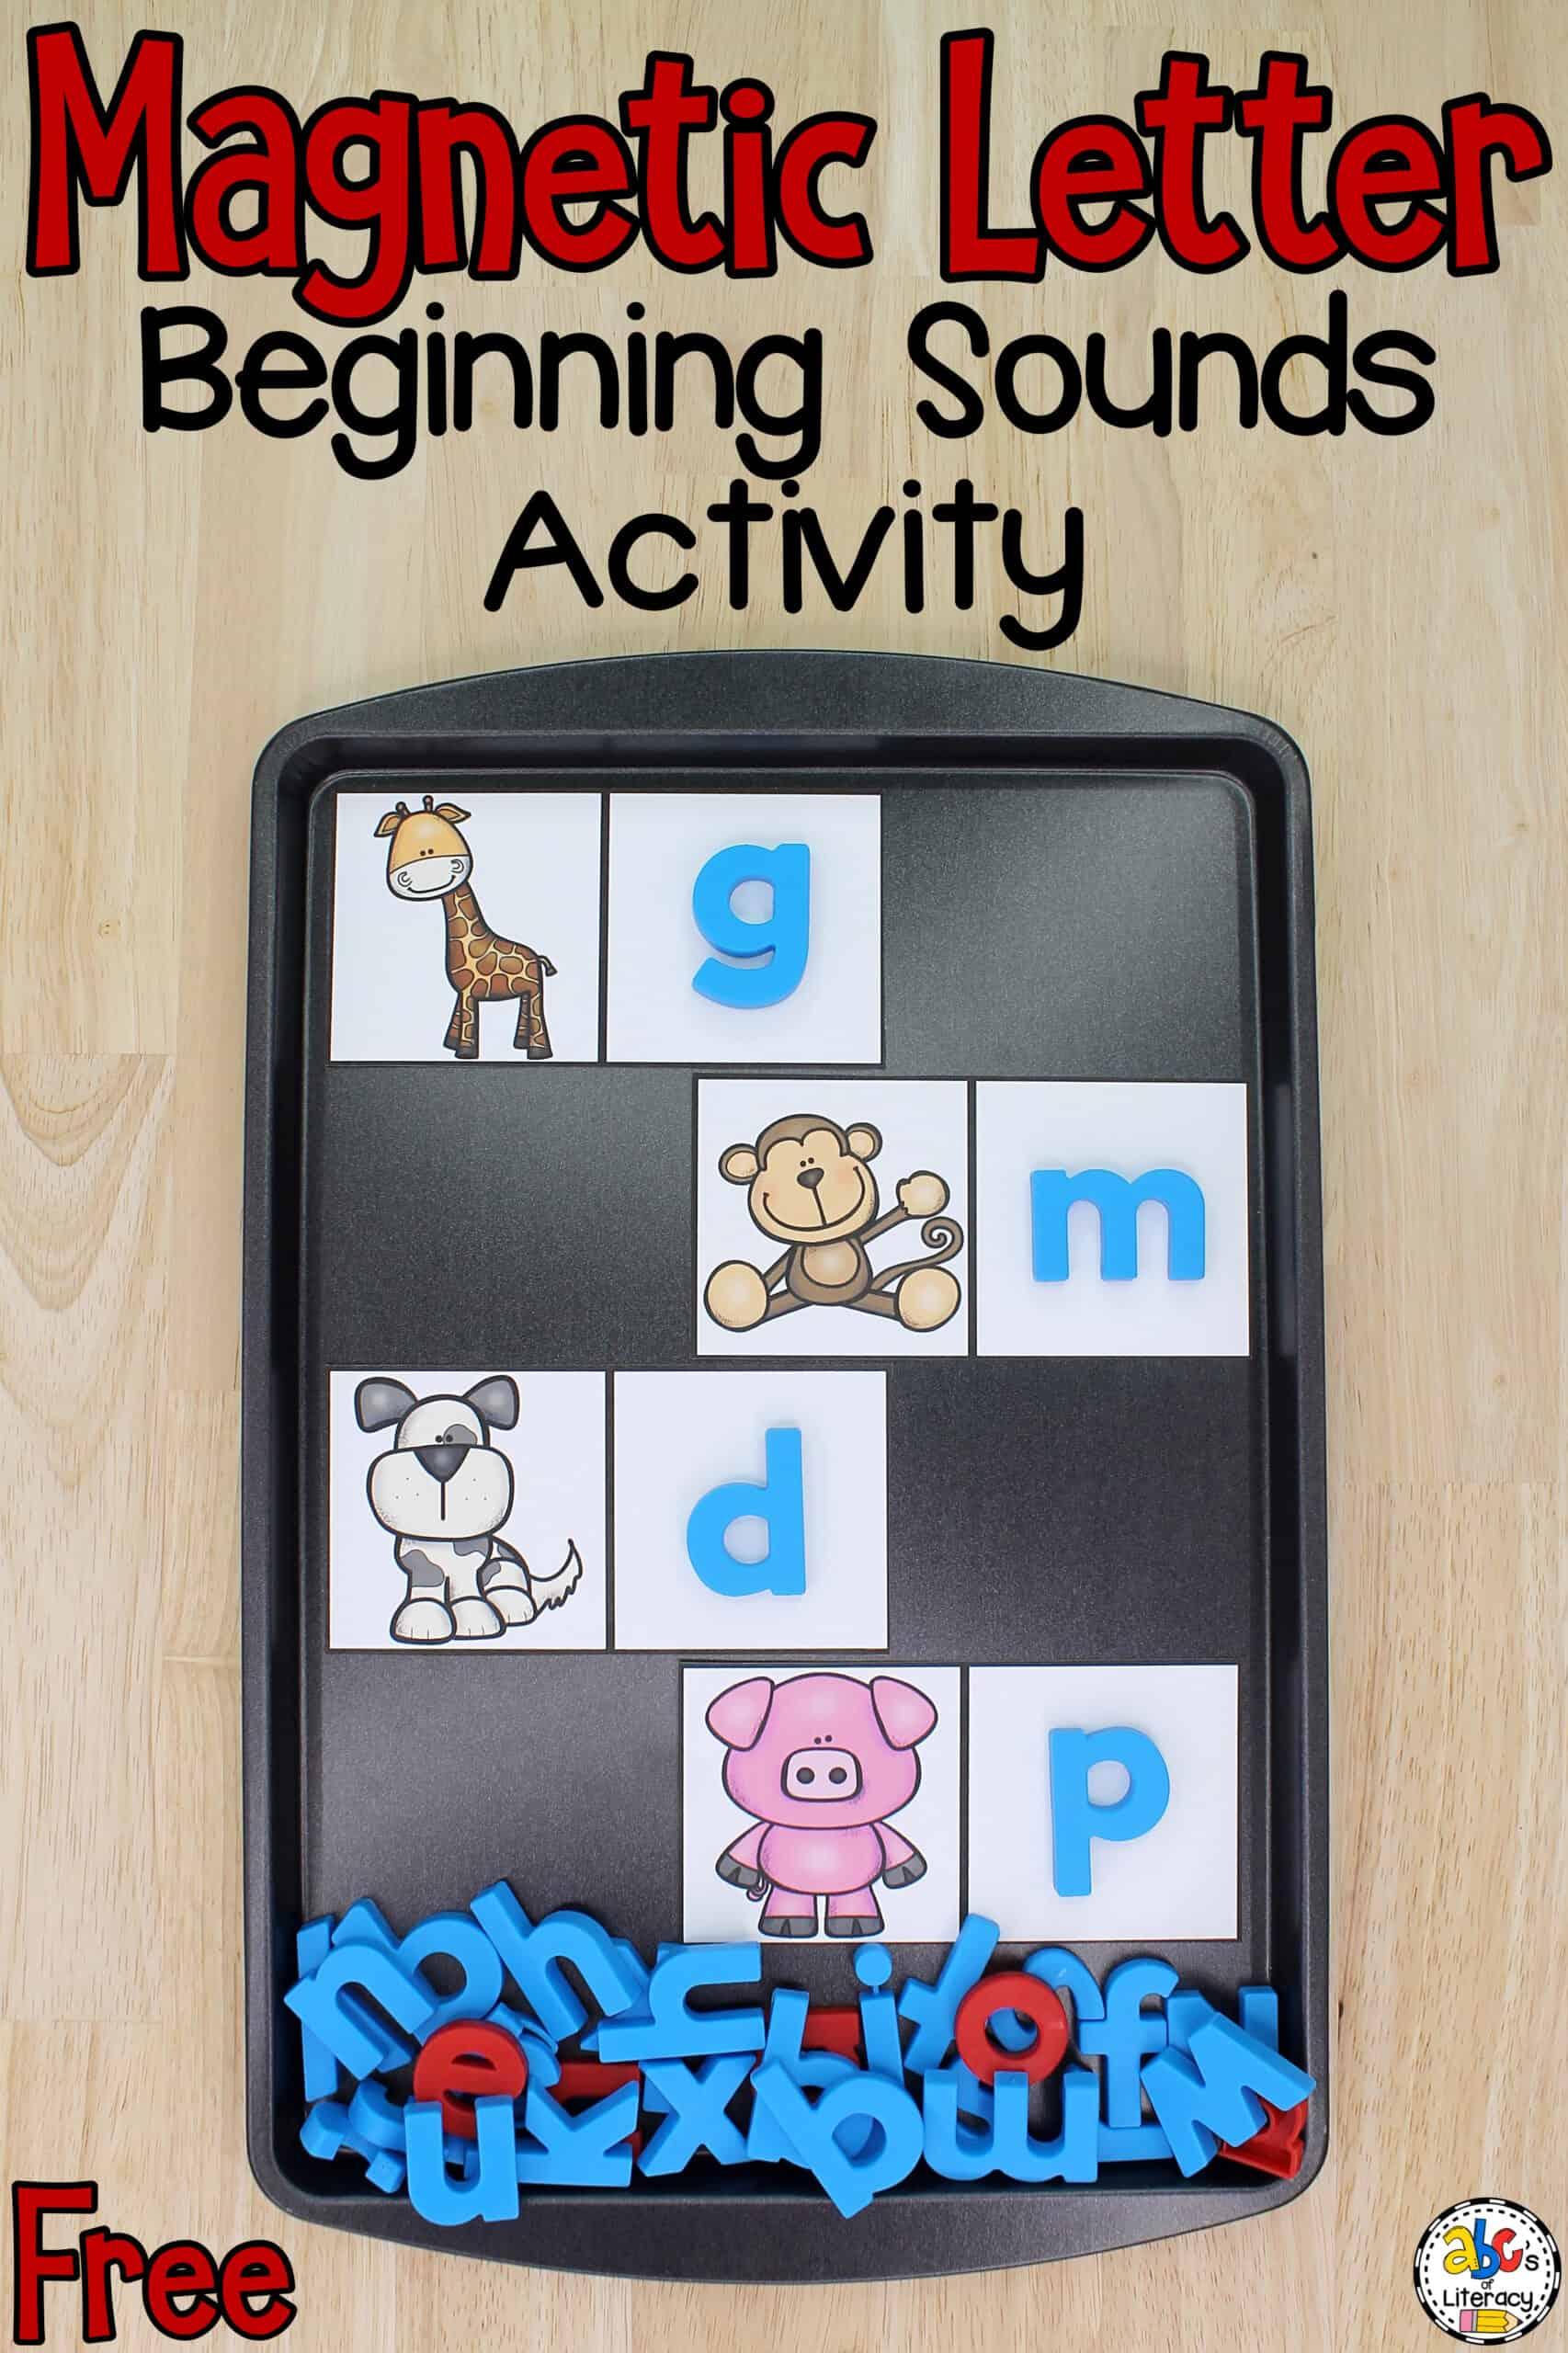 Magnetic Letter Beginning Sounds Activity